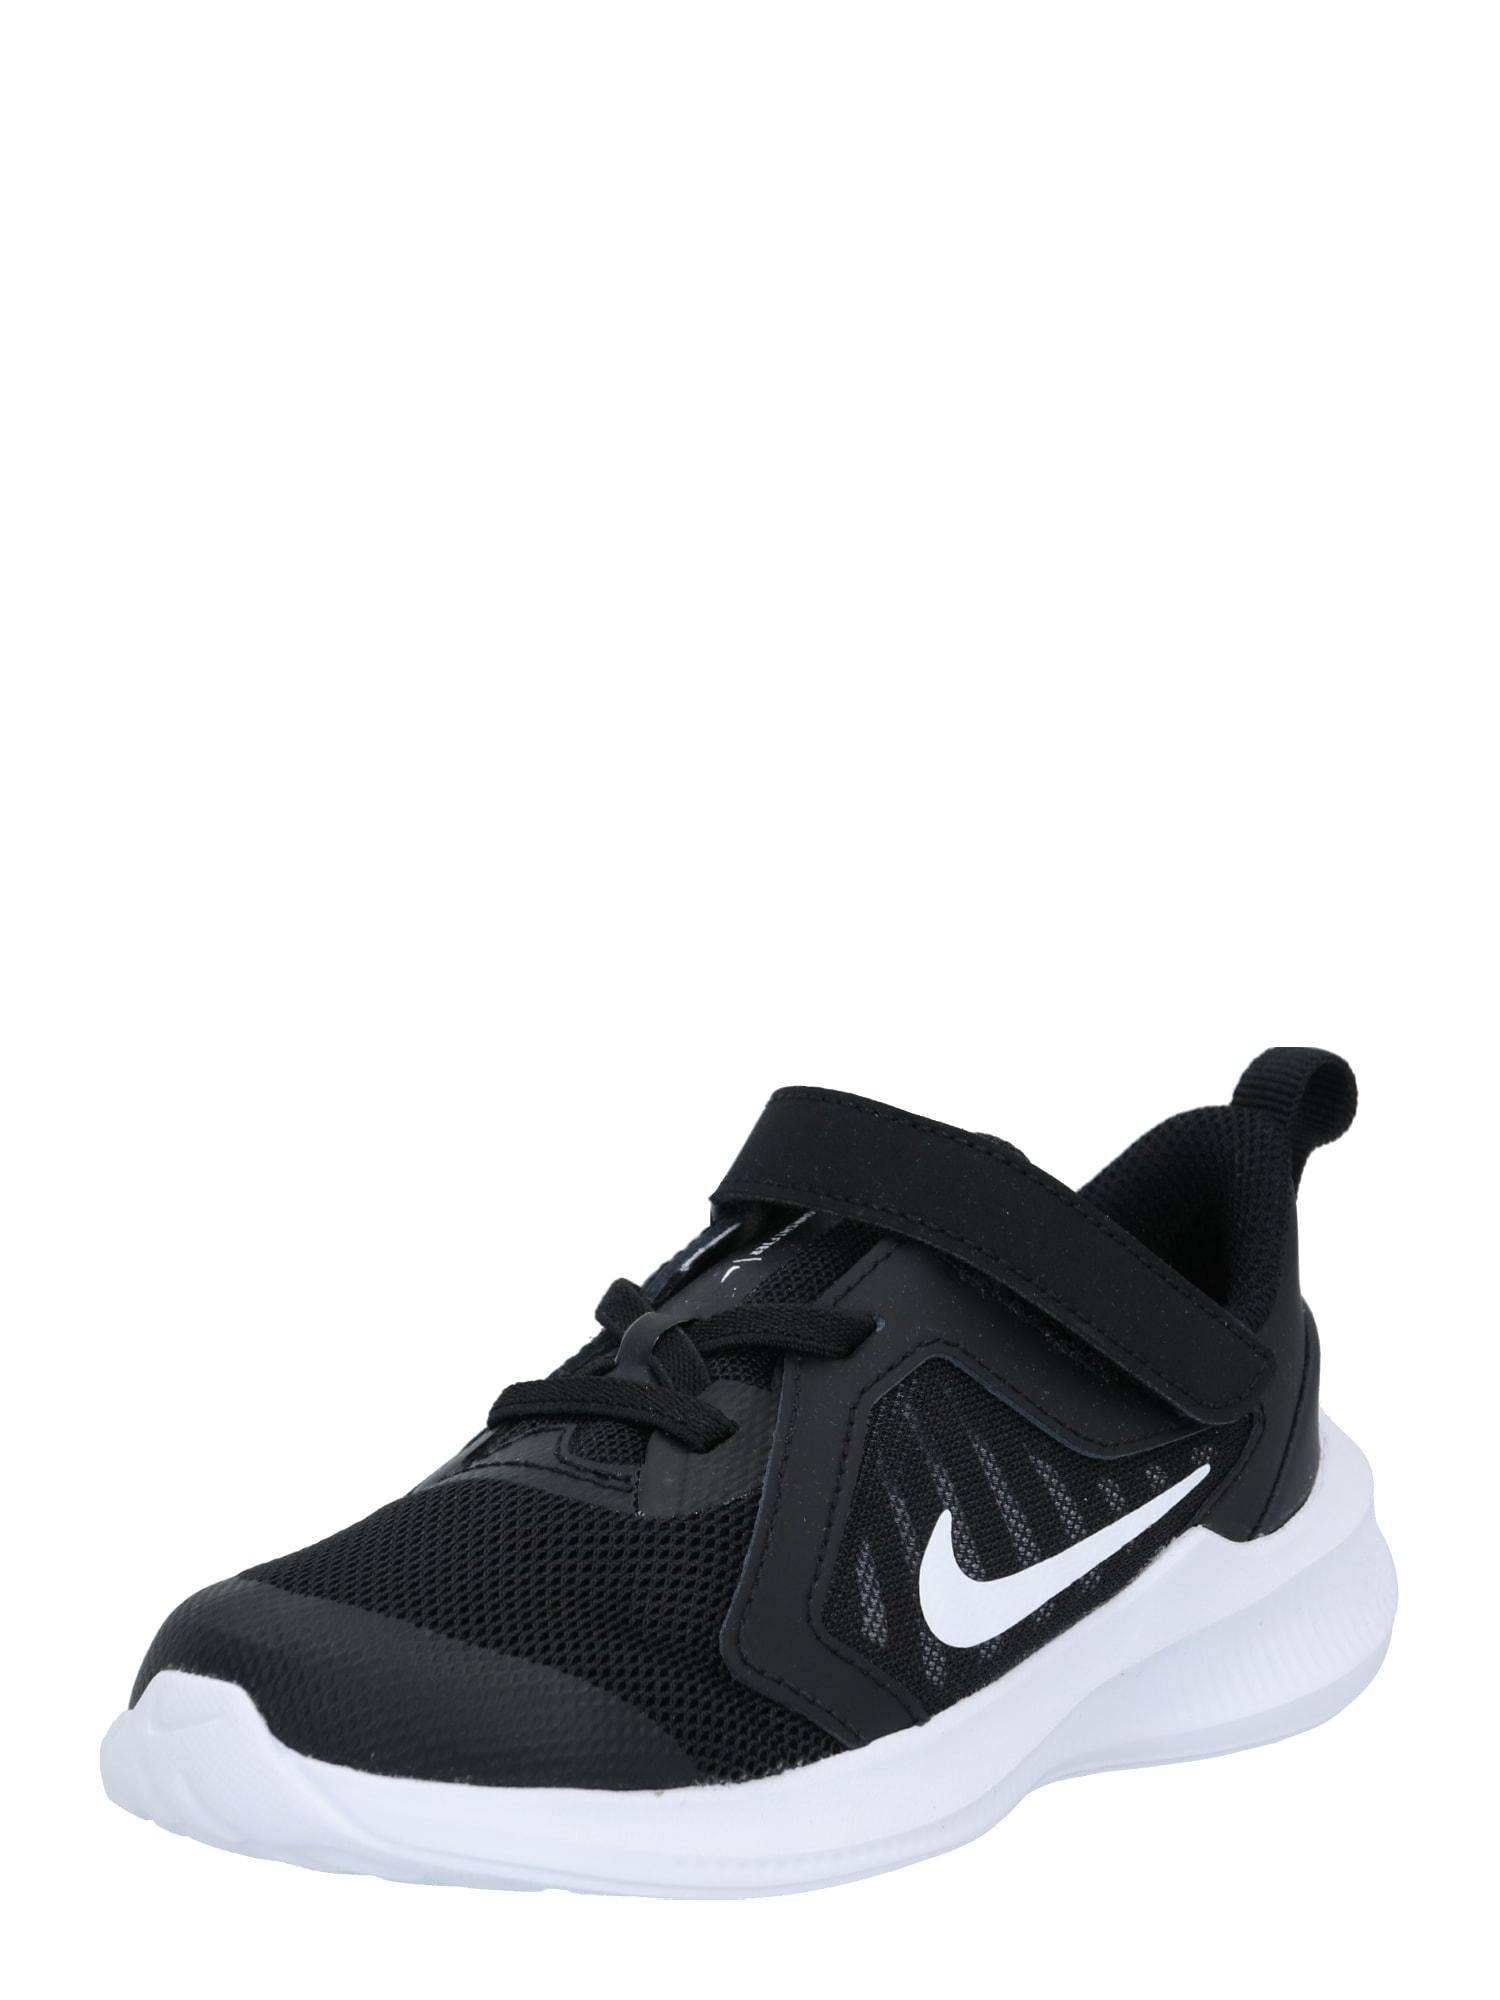 NIKE Sportiniai batai 'Downshifter 10' juoda / balta